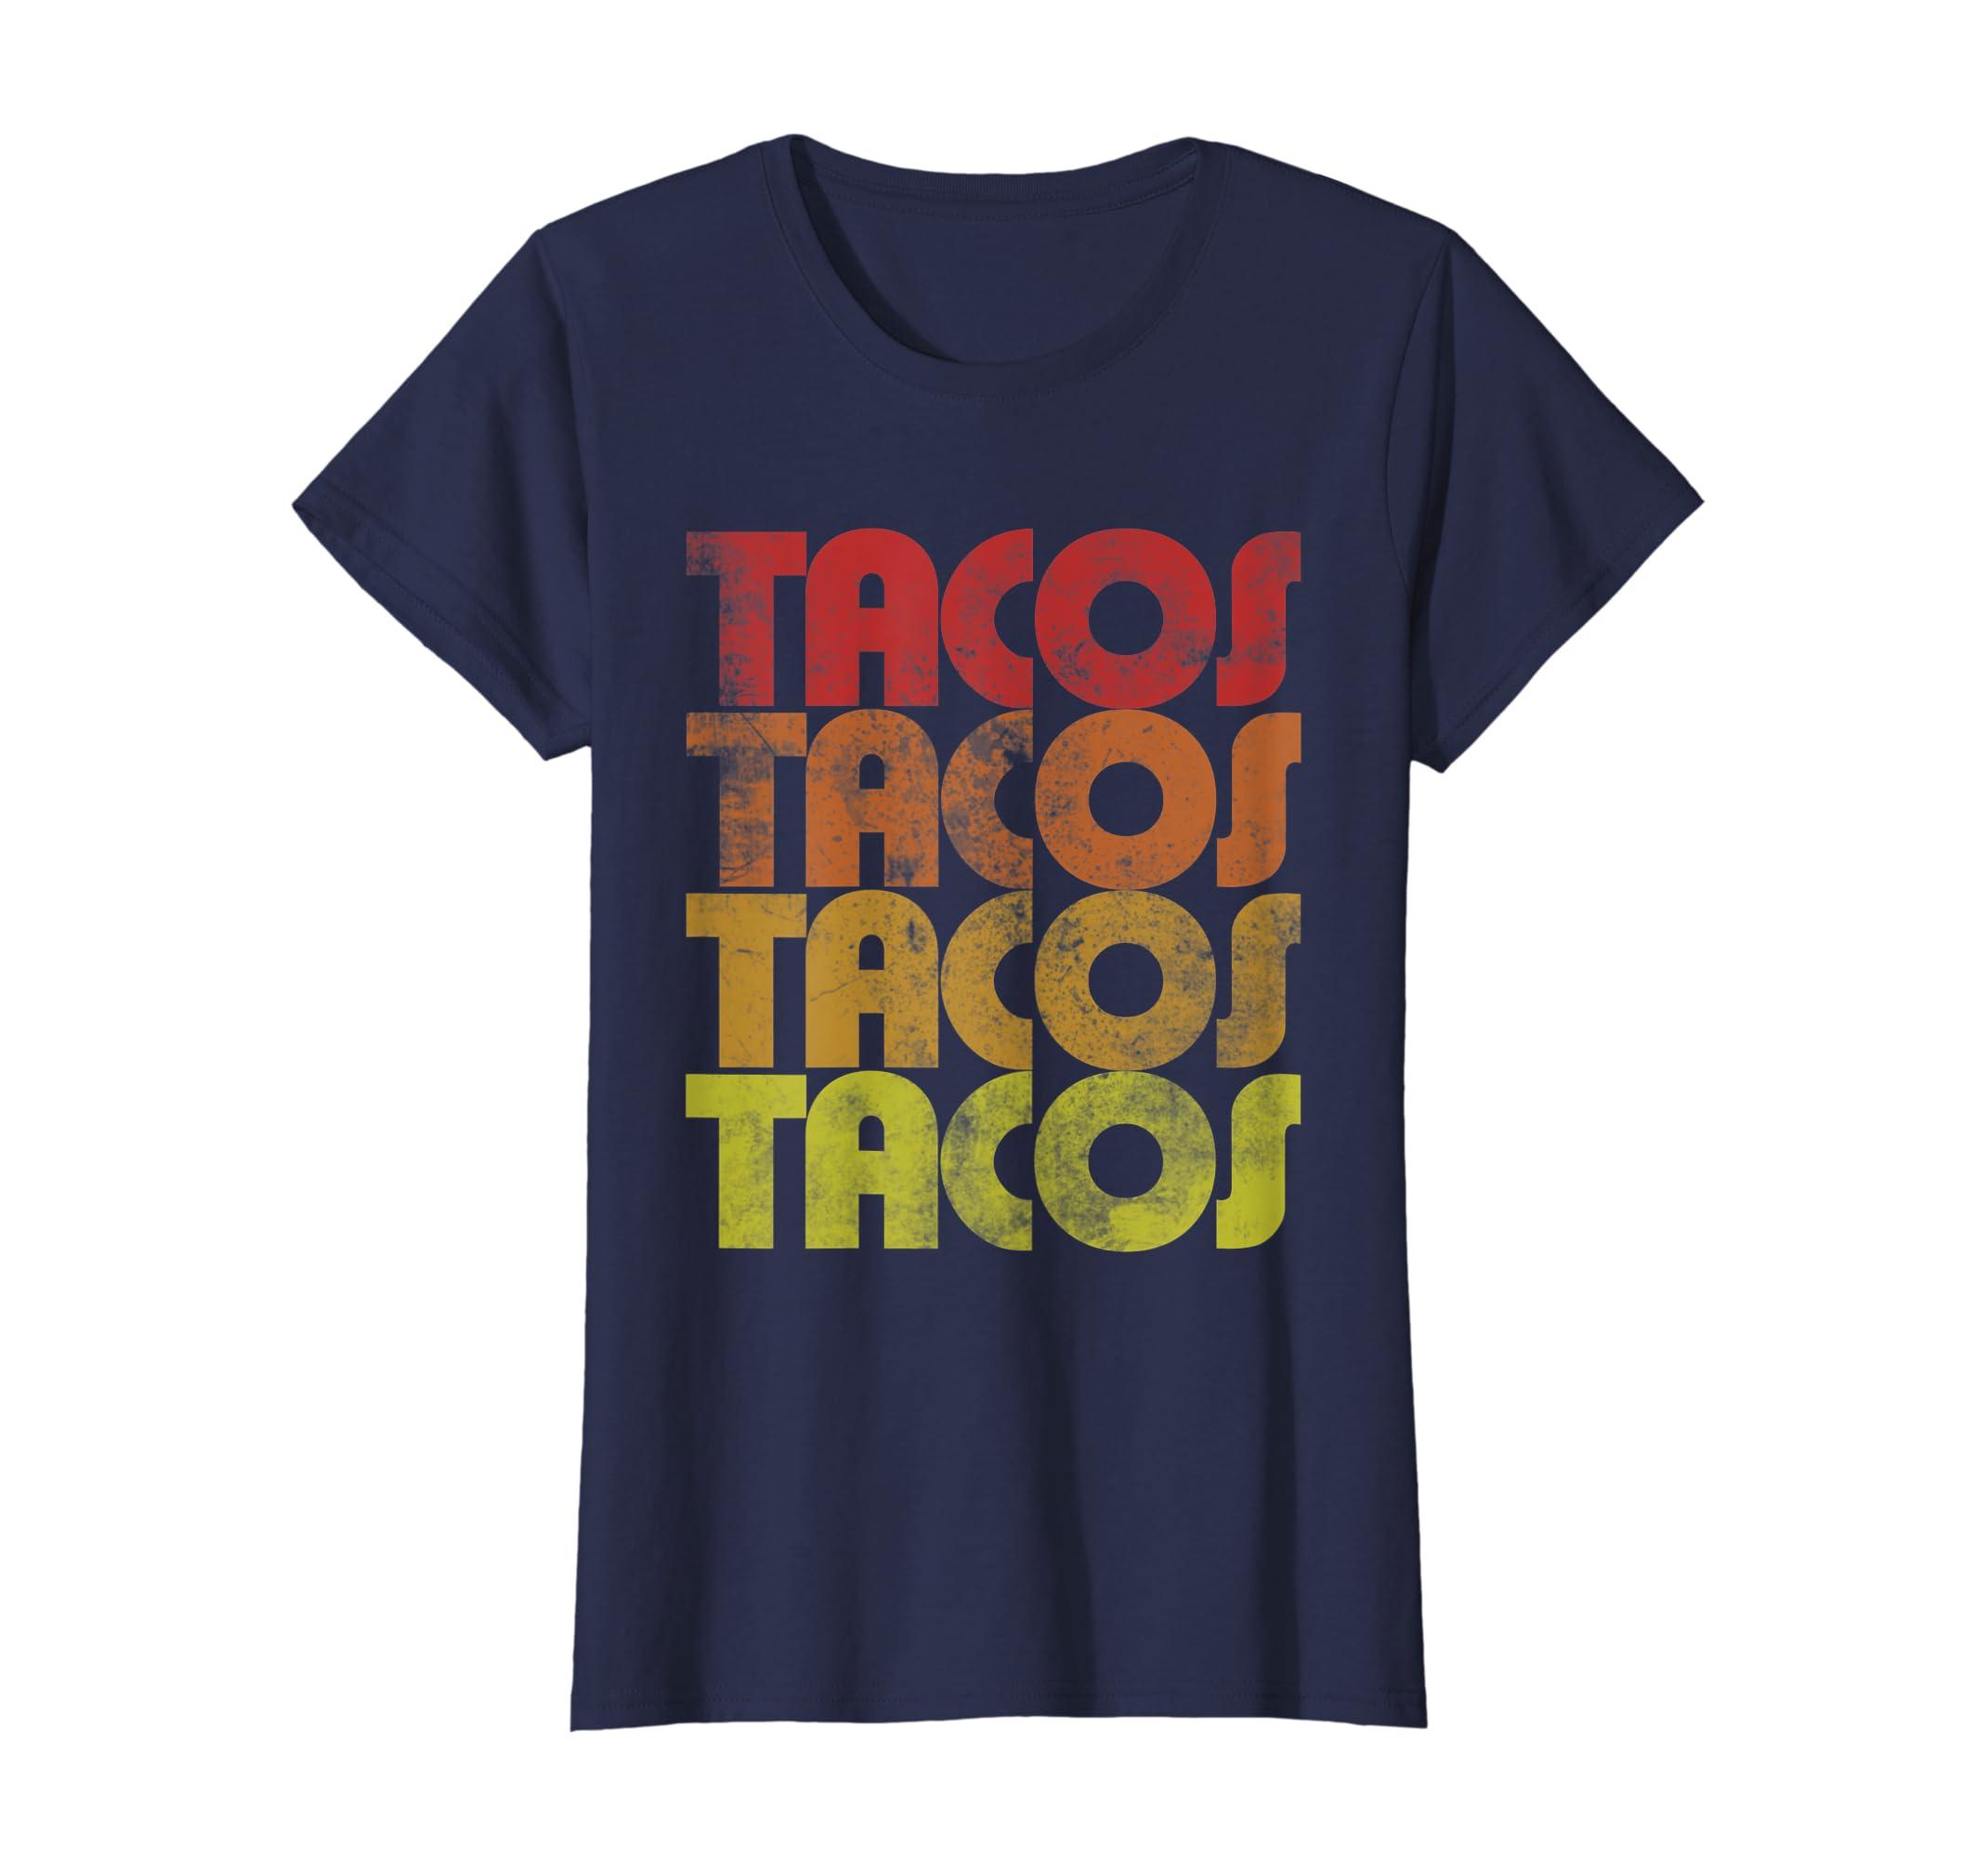 061c2f660bc Amazon.com  Retro Tacos t-shirt Vintage Taco Tuesday shirt  Clothing